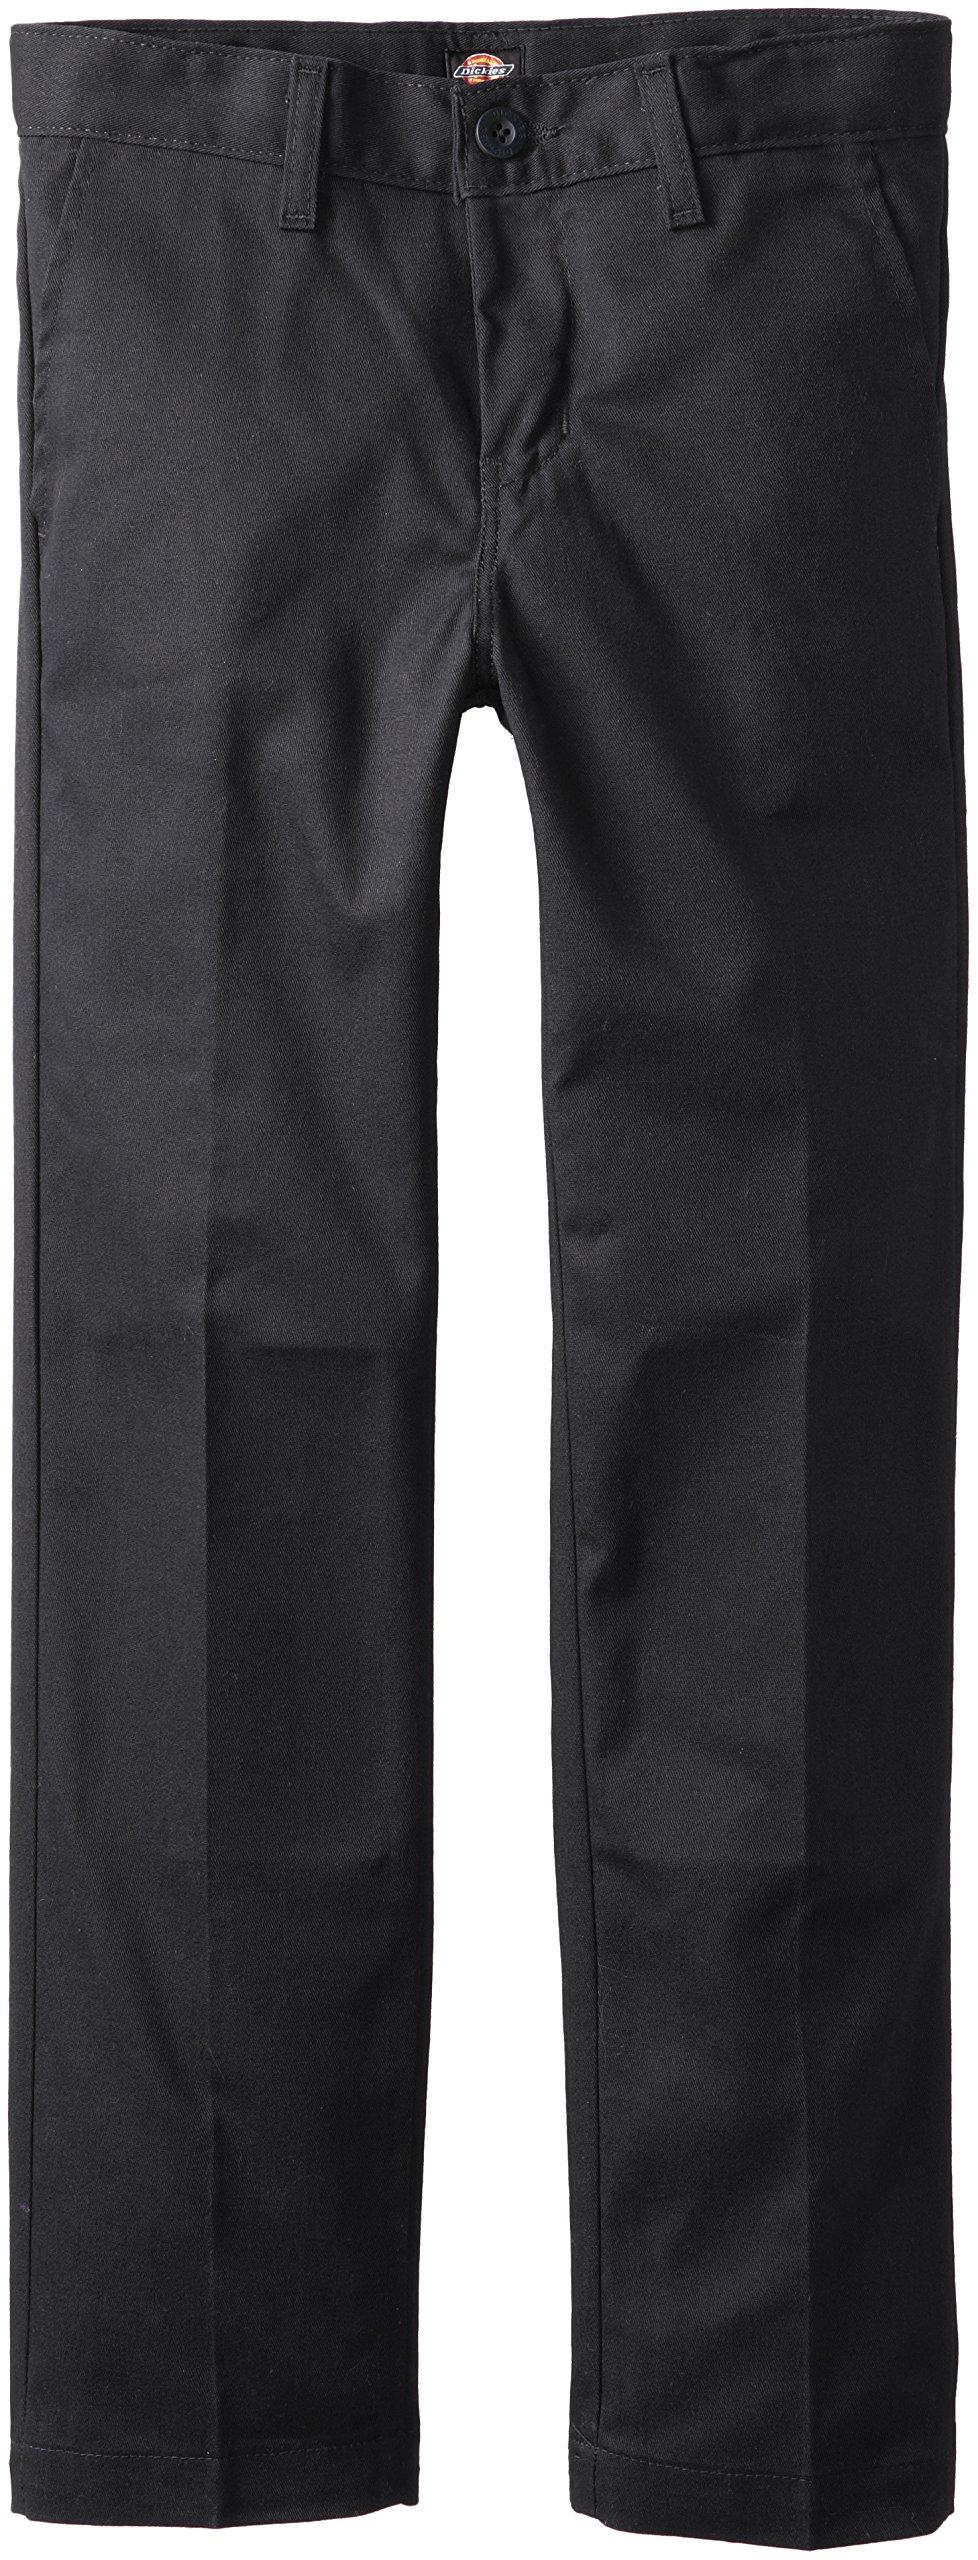 Dickies Khaki Big Boys' Flex Waist Slim Stretch Pant, Black, 10